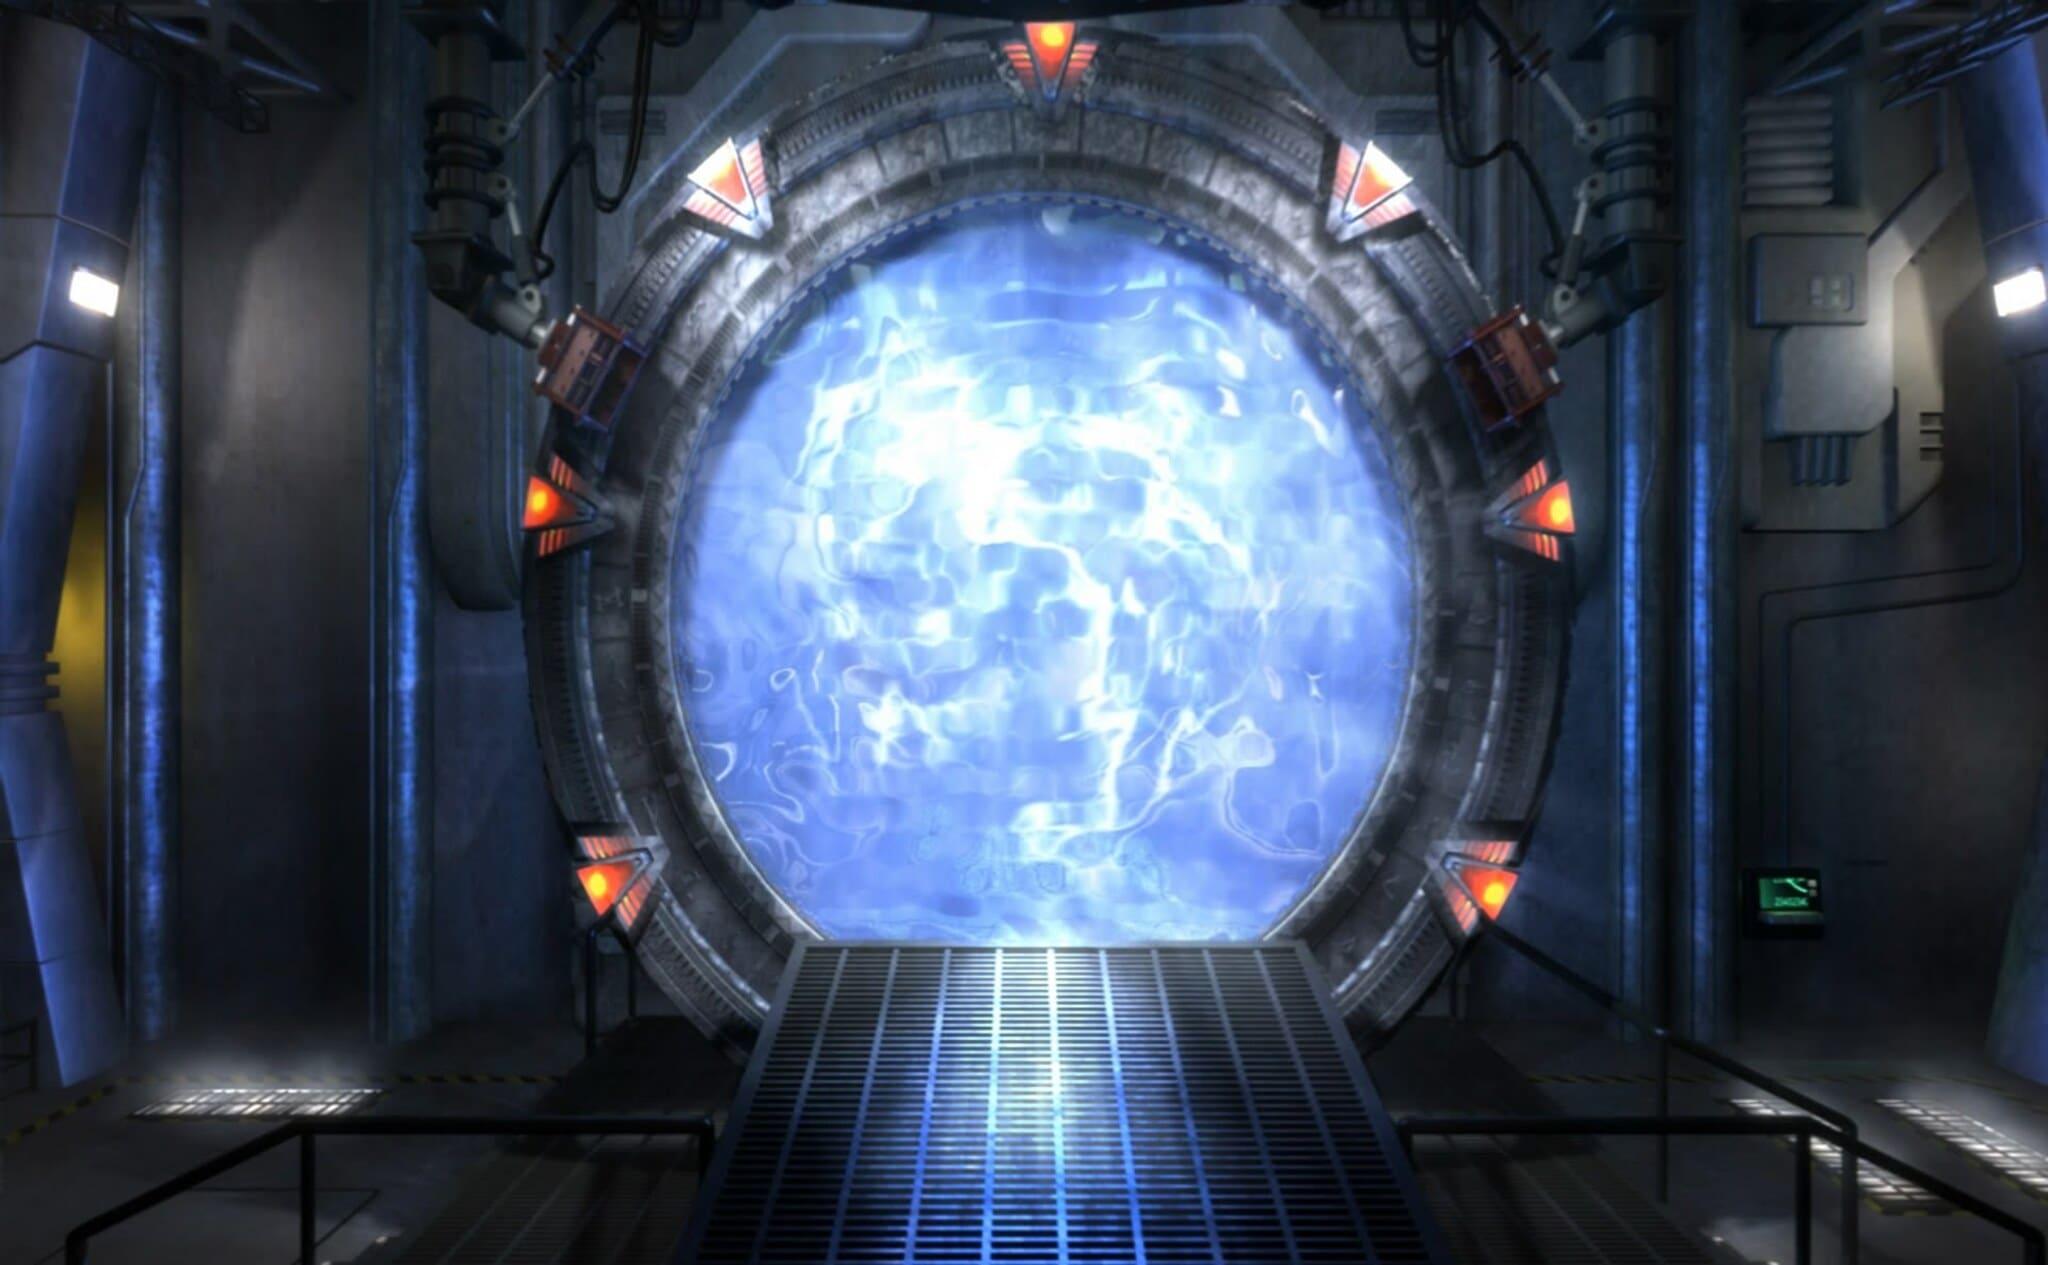 Stargate la puerta de las estrellas